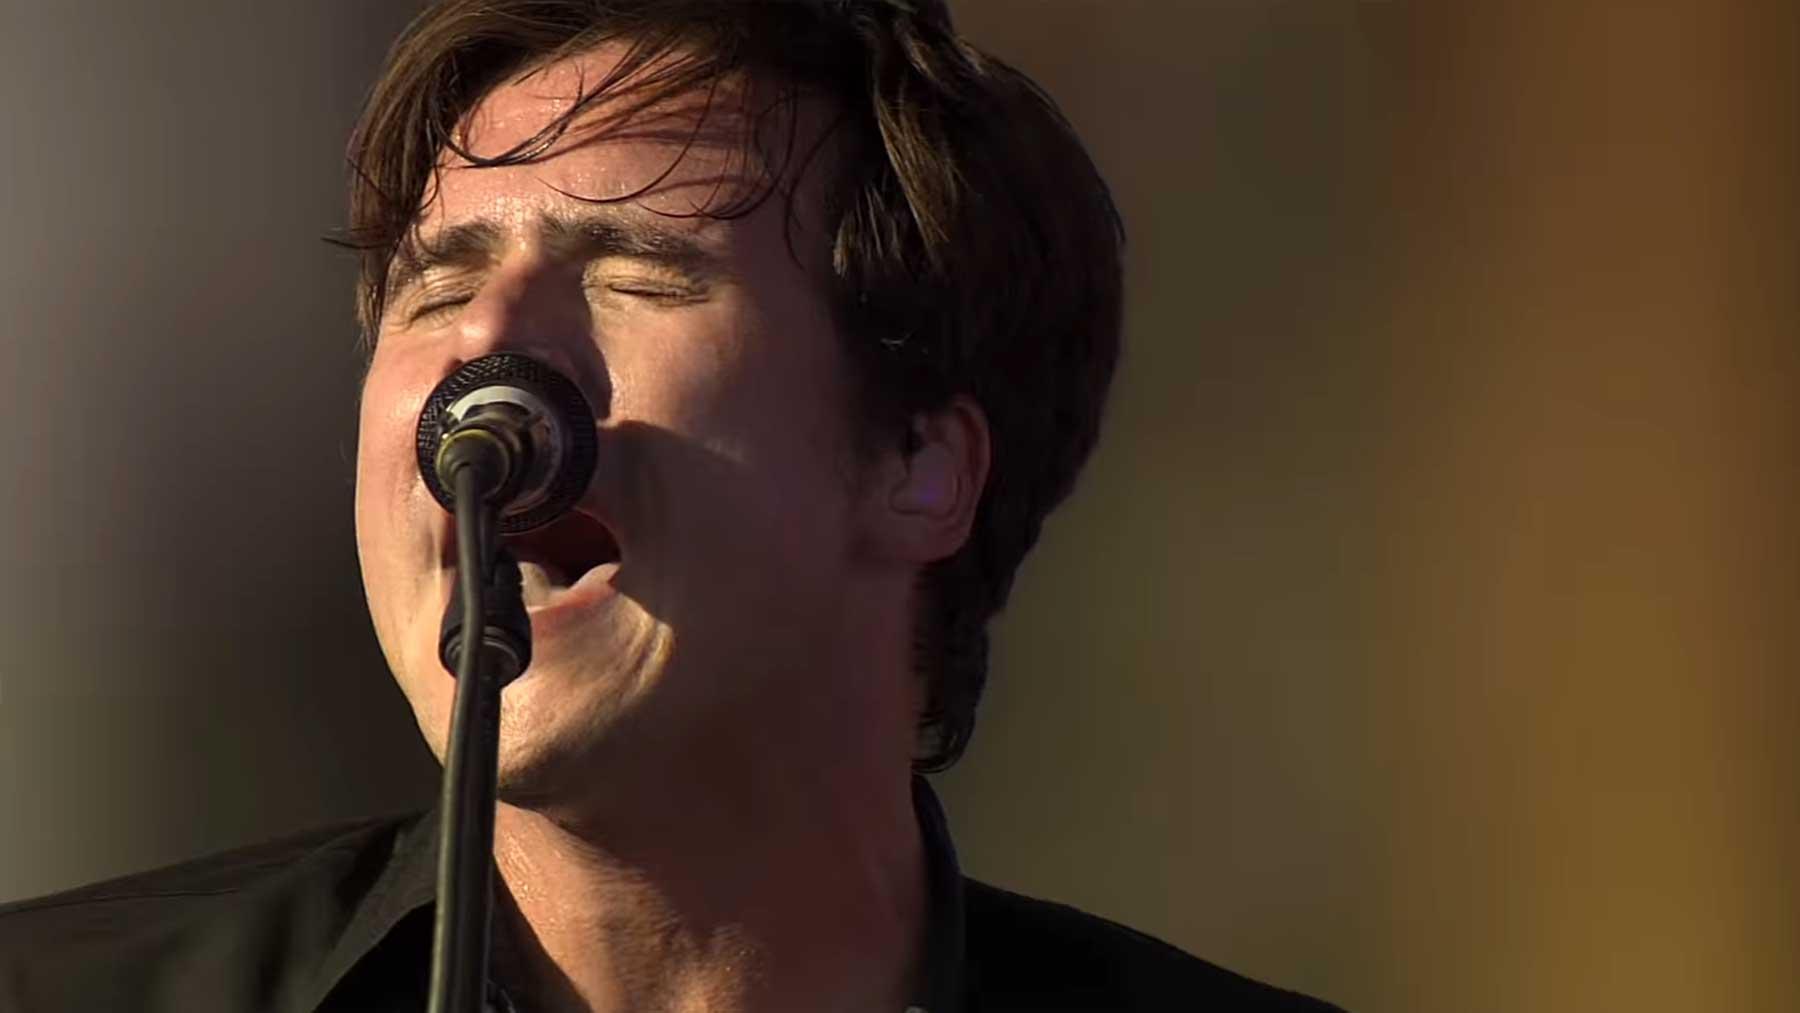 Jimmy Eat World: Komplettes Live-Set vom Coachella Festival 2011